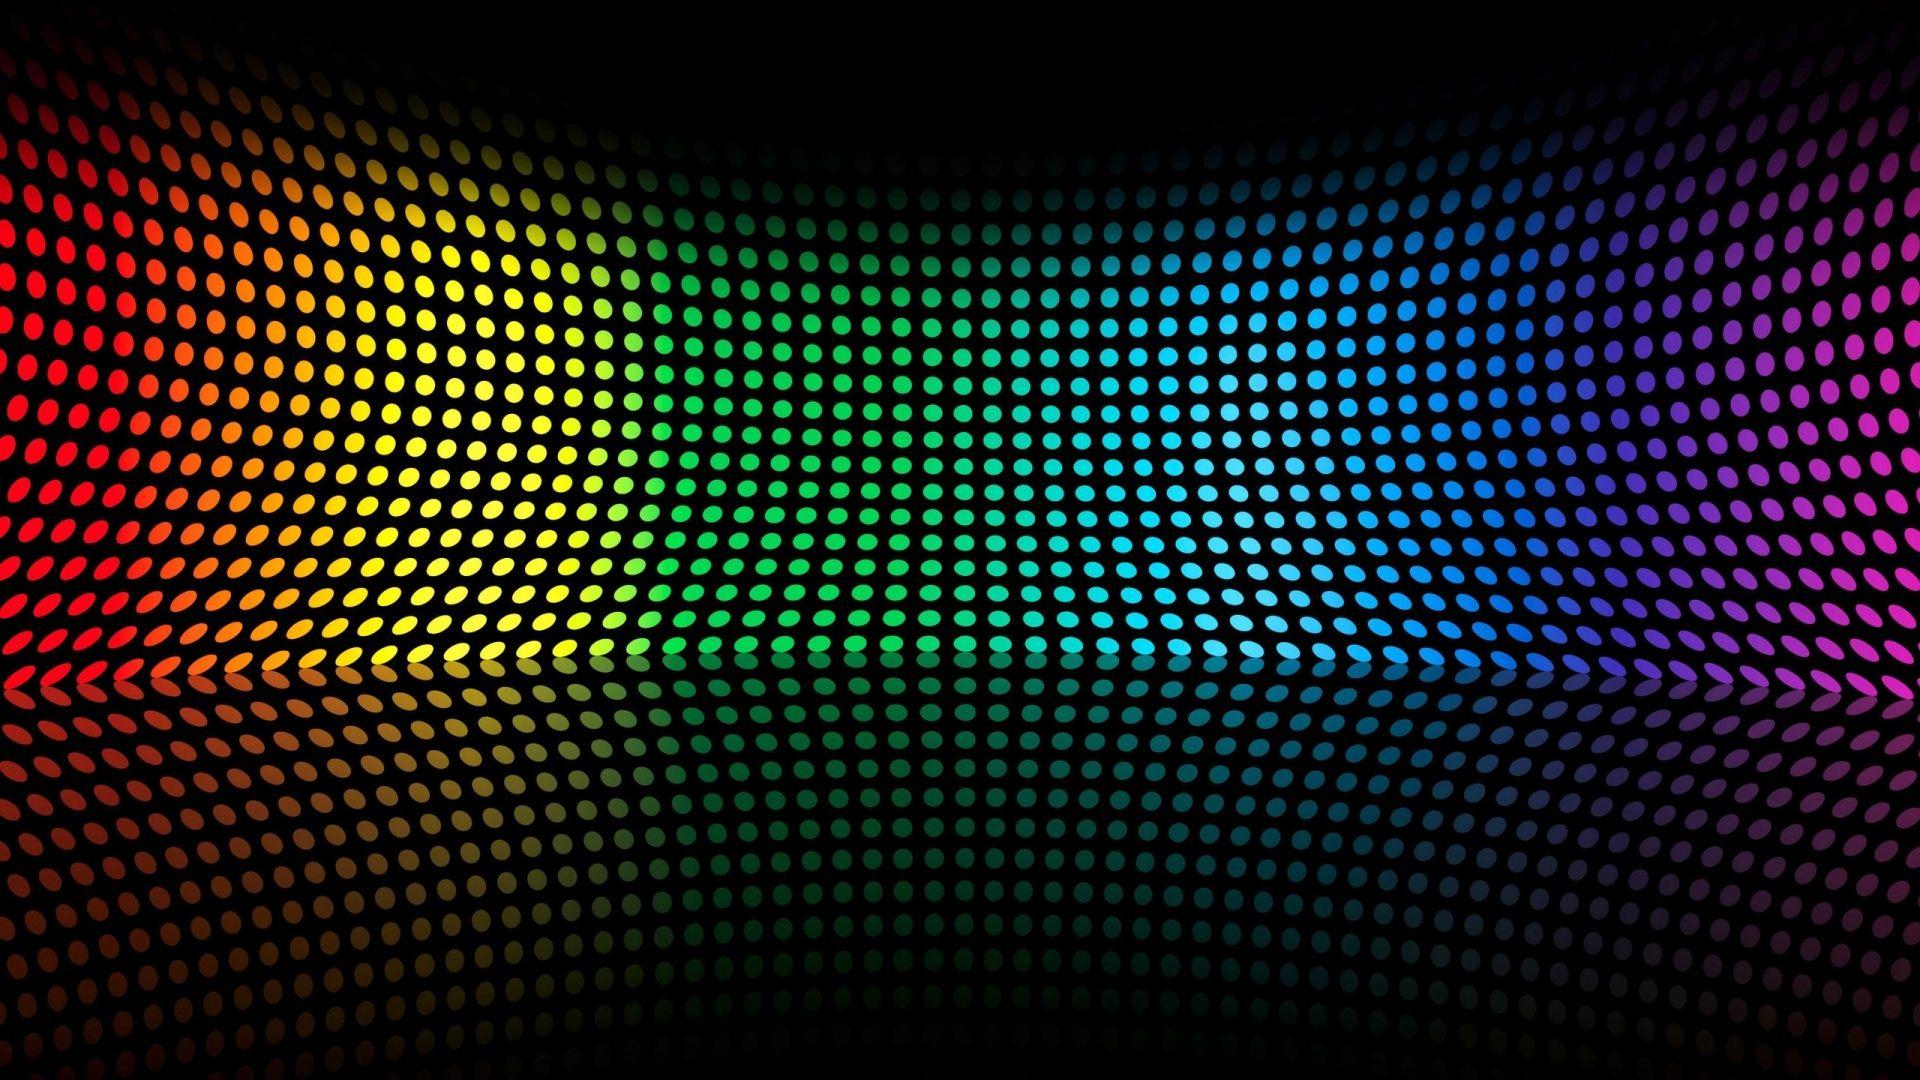 Full Hd 1080p Colorful Wallpapers Hd Desktop Backgrounds 1920x1080 Digital Wallpaper 2048x1152 Wallpapers Cool 3d Wallpapers